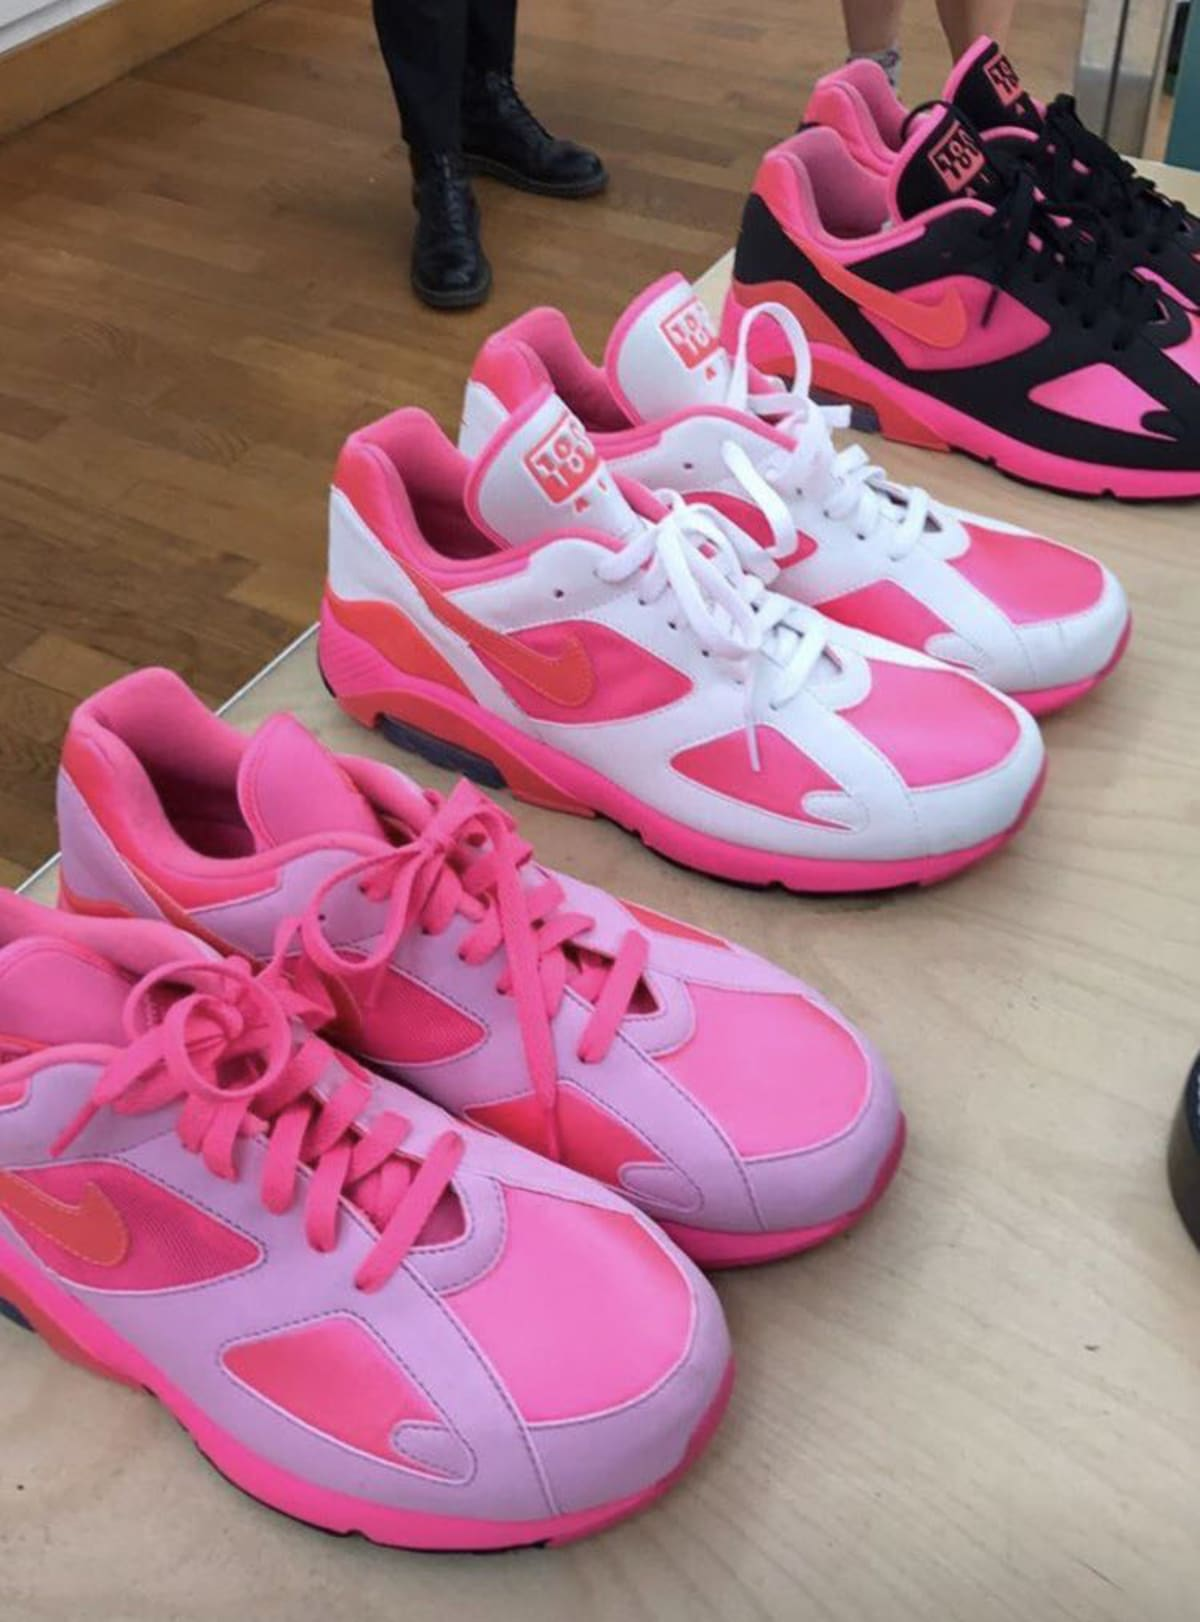 0826306d770d CDG Nike Air 180 AO4641-600 Release Date